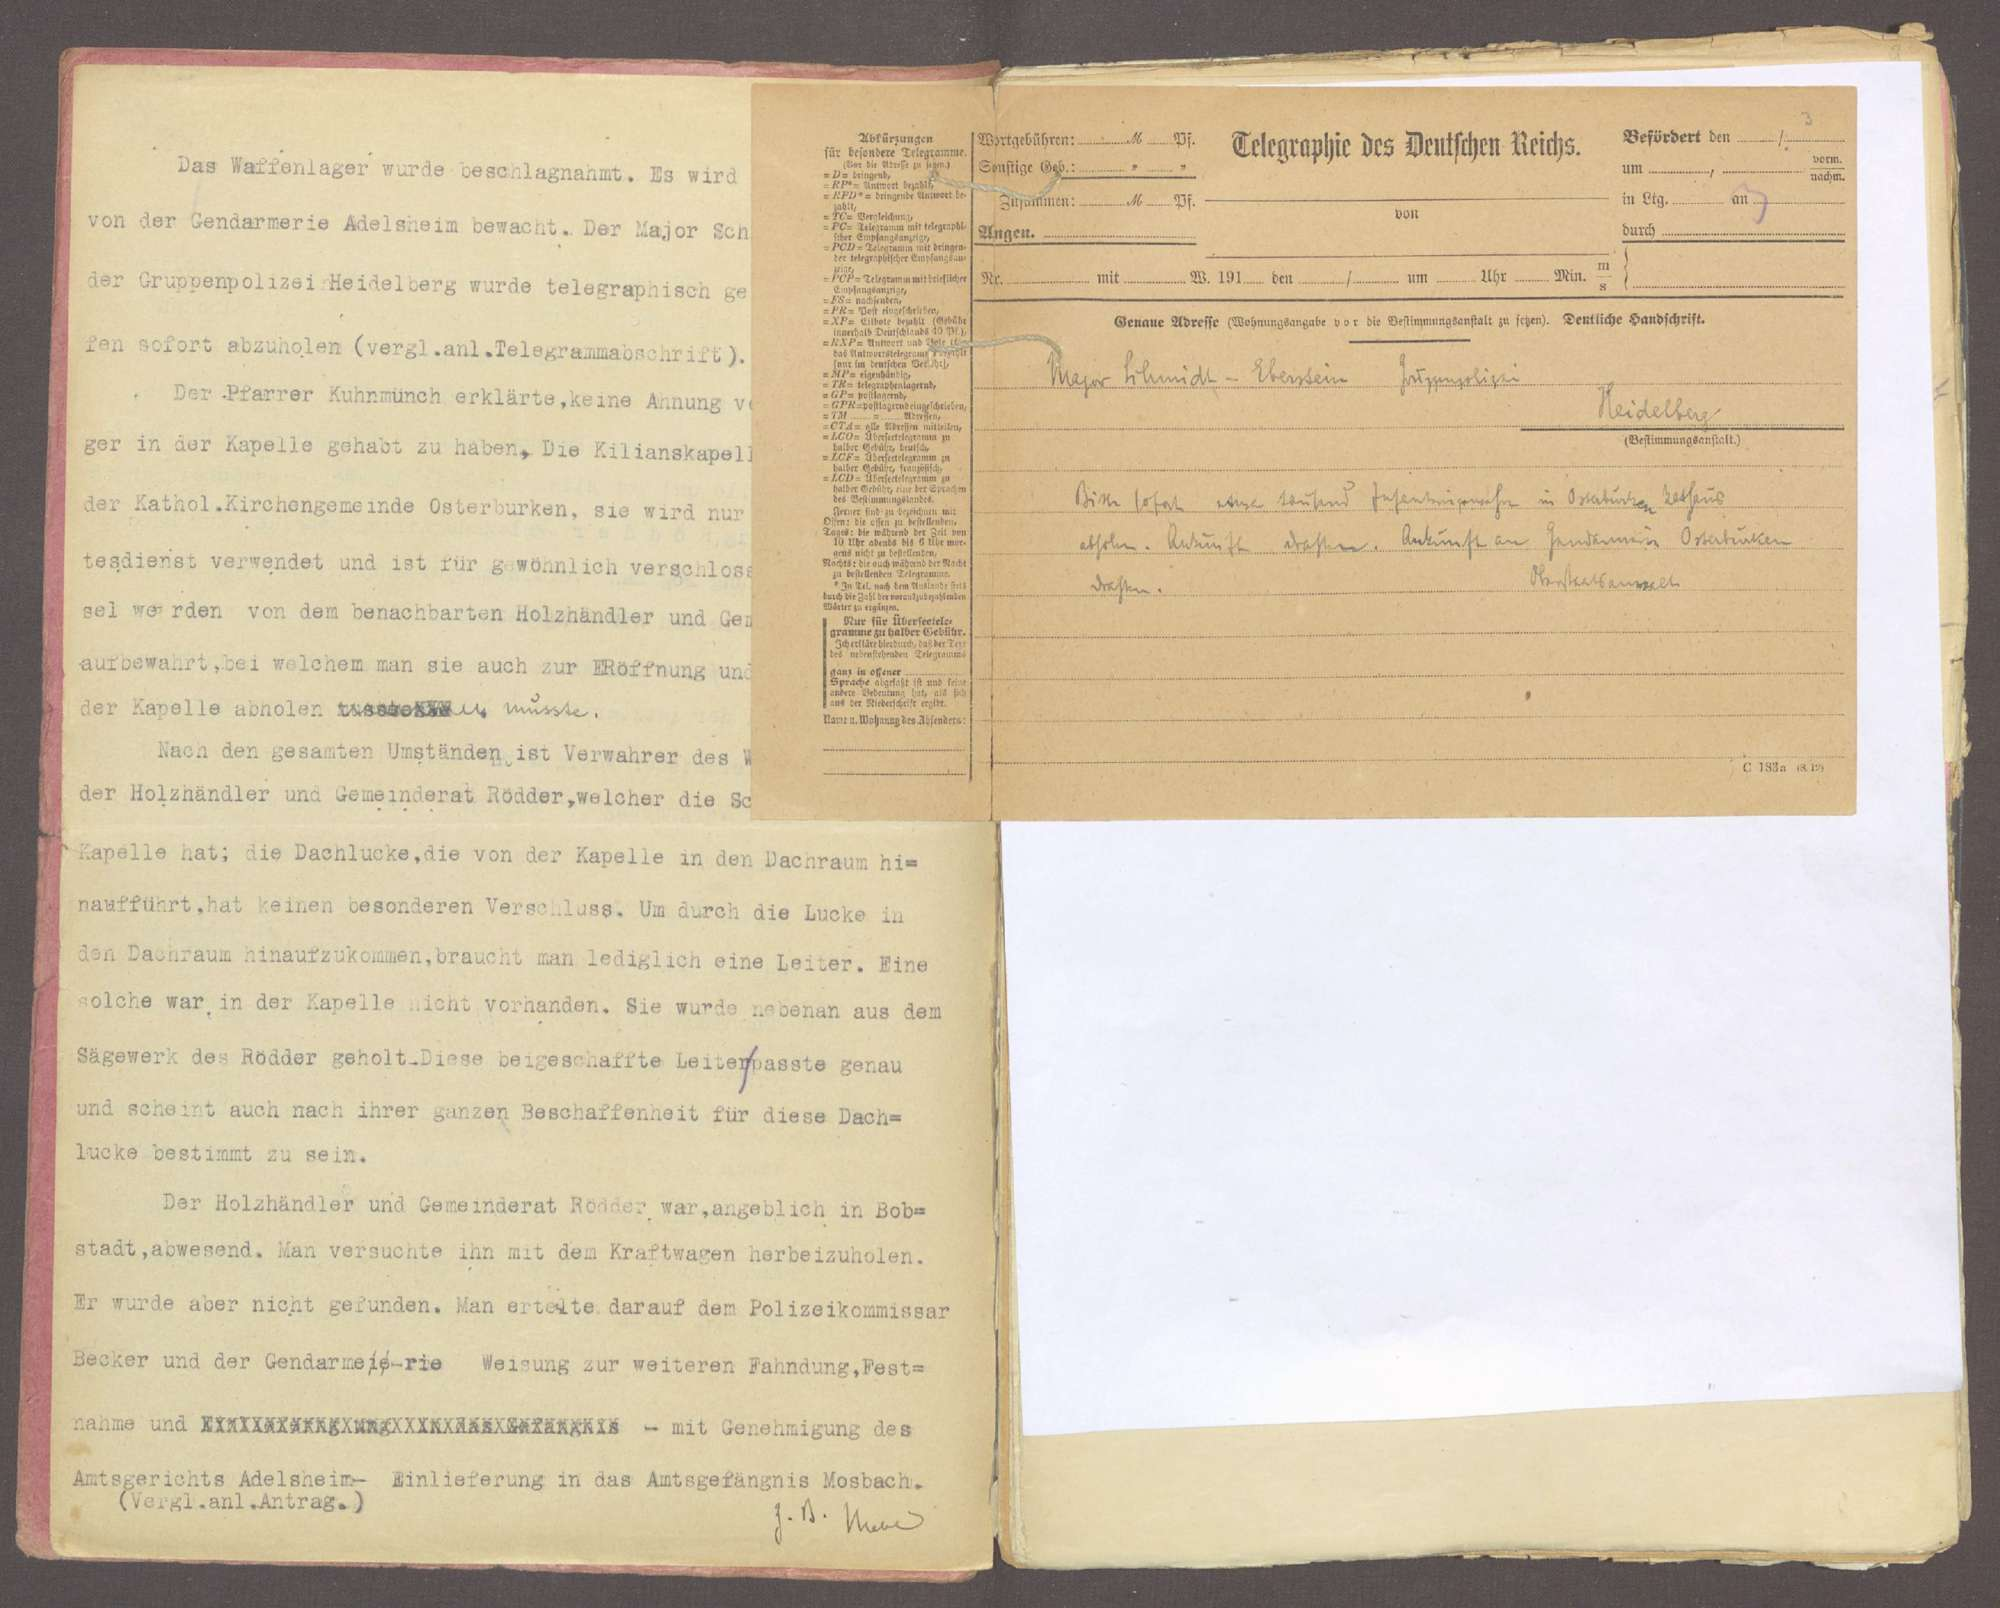 Honikel, August, geb. 09.12.1884 in Dittwar, Obereisenbahnsekretär, Bild 3